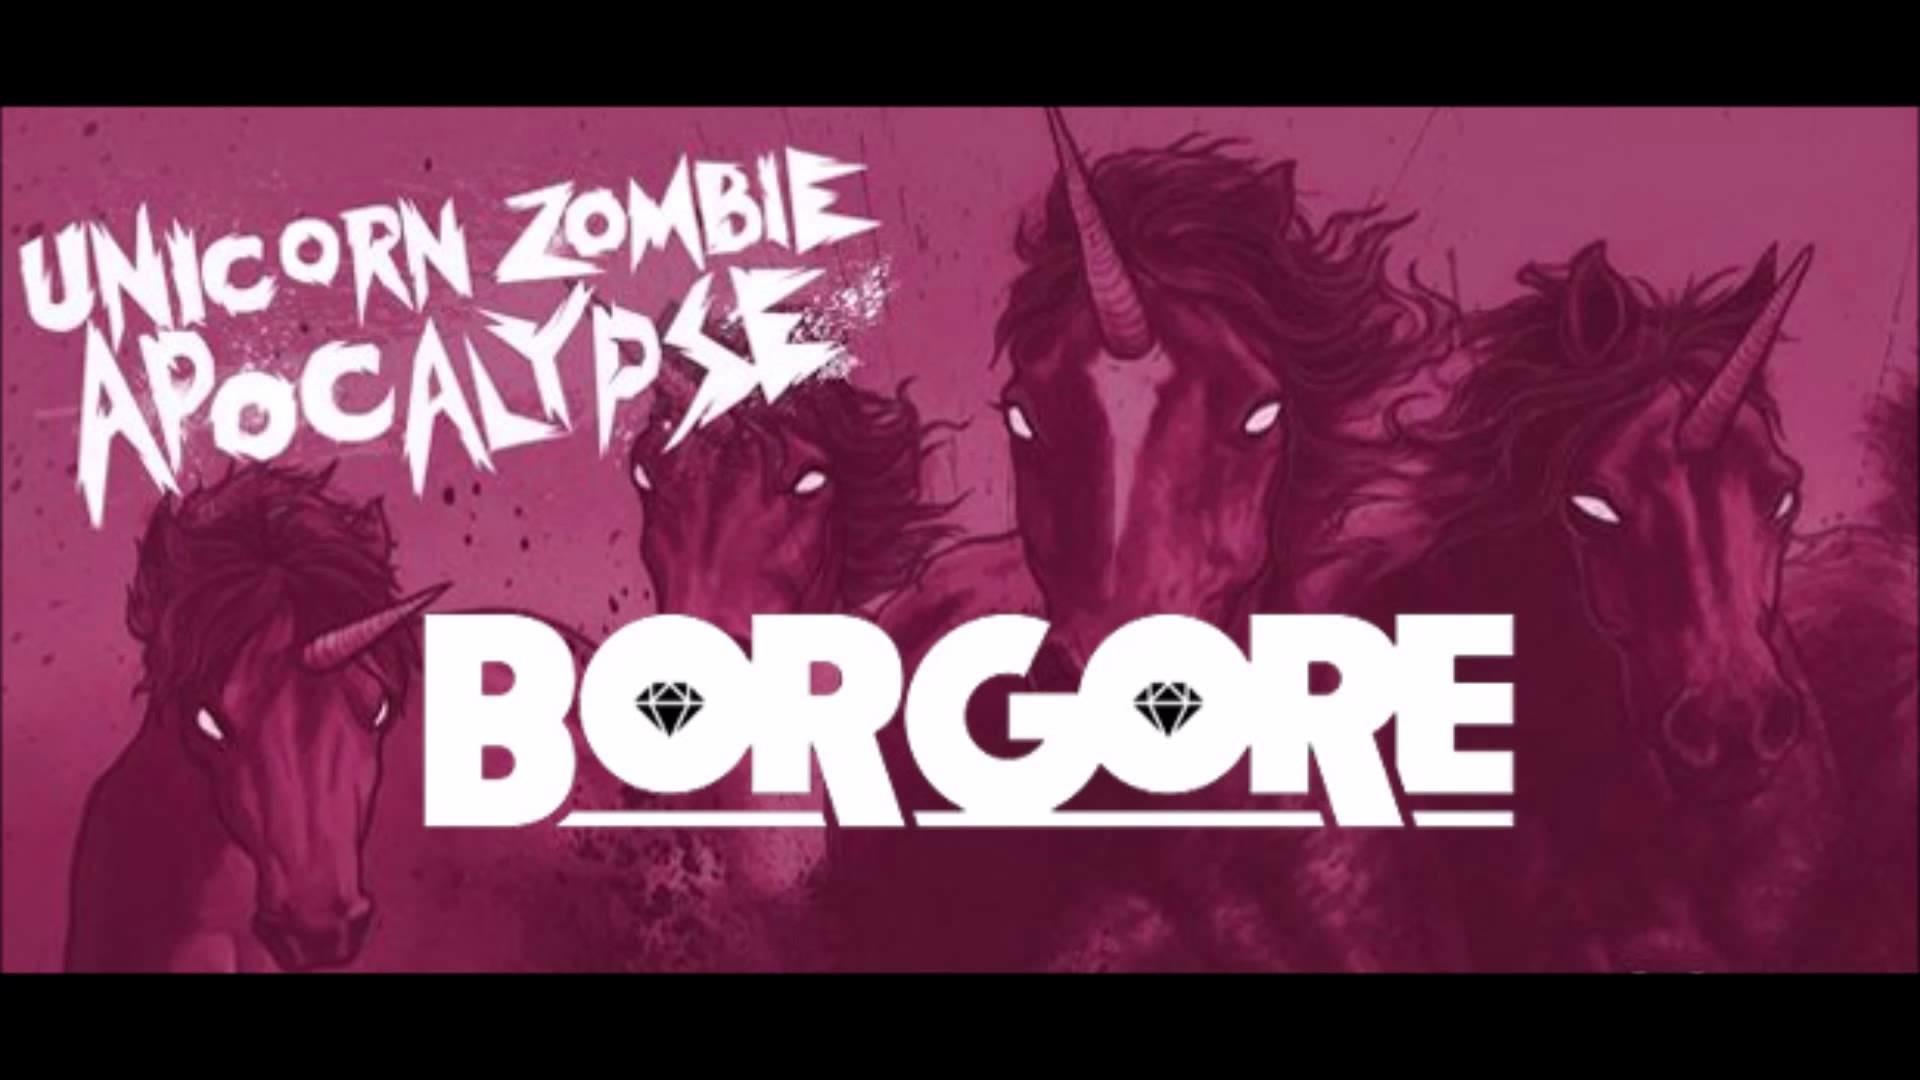 Borgore & Sikdope – Unicorn Zombie Apocalypse HD